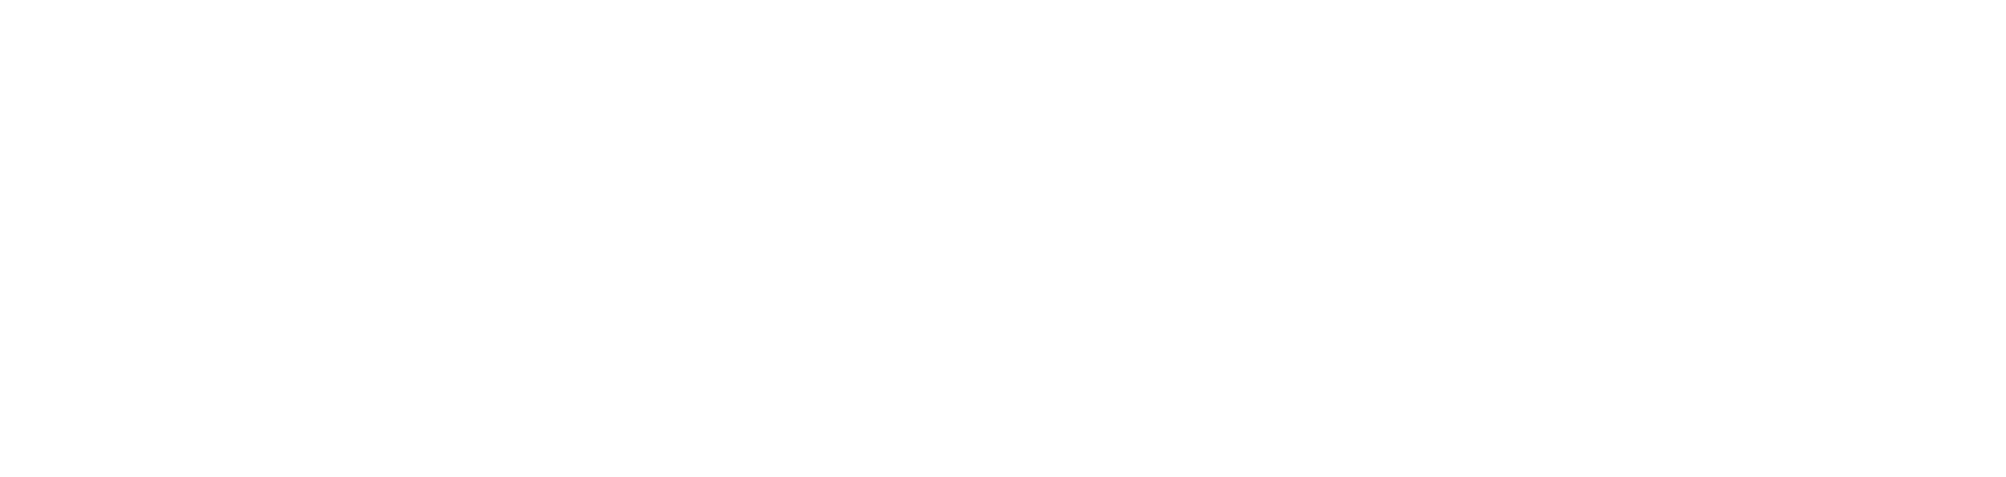 Hub Zero هب زيرو